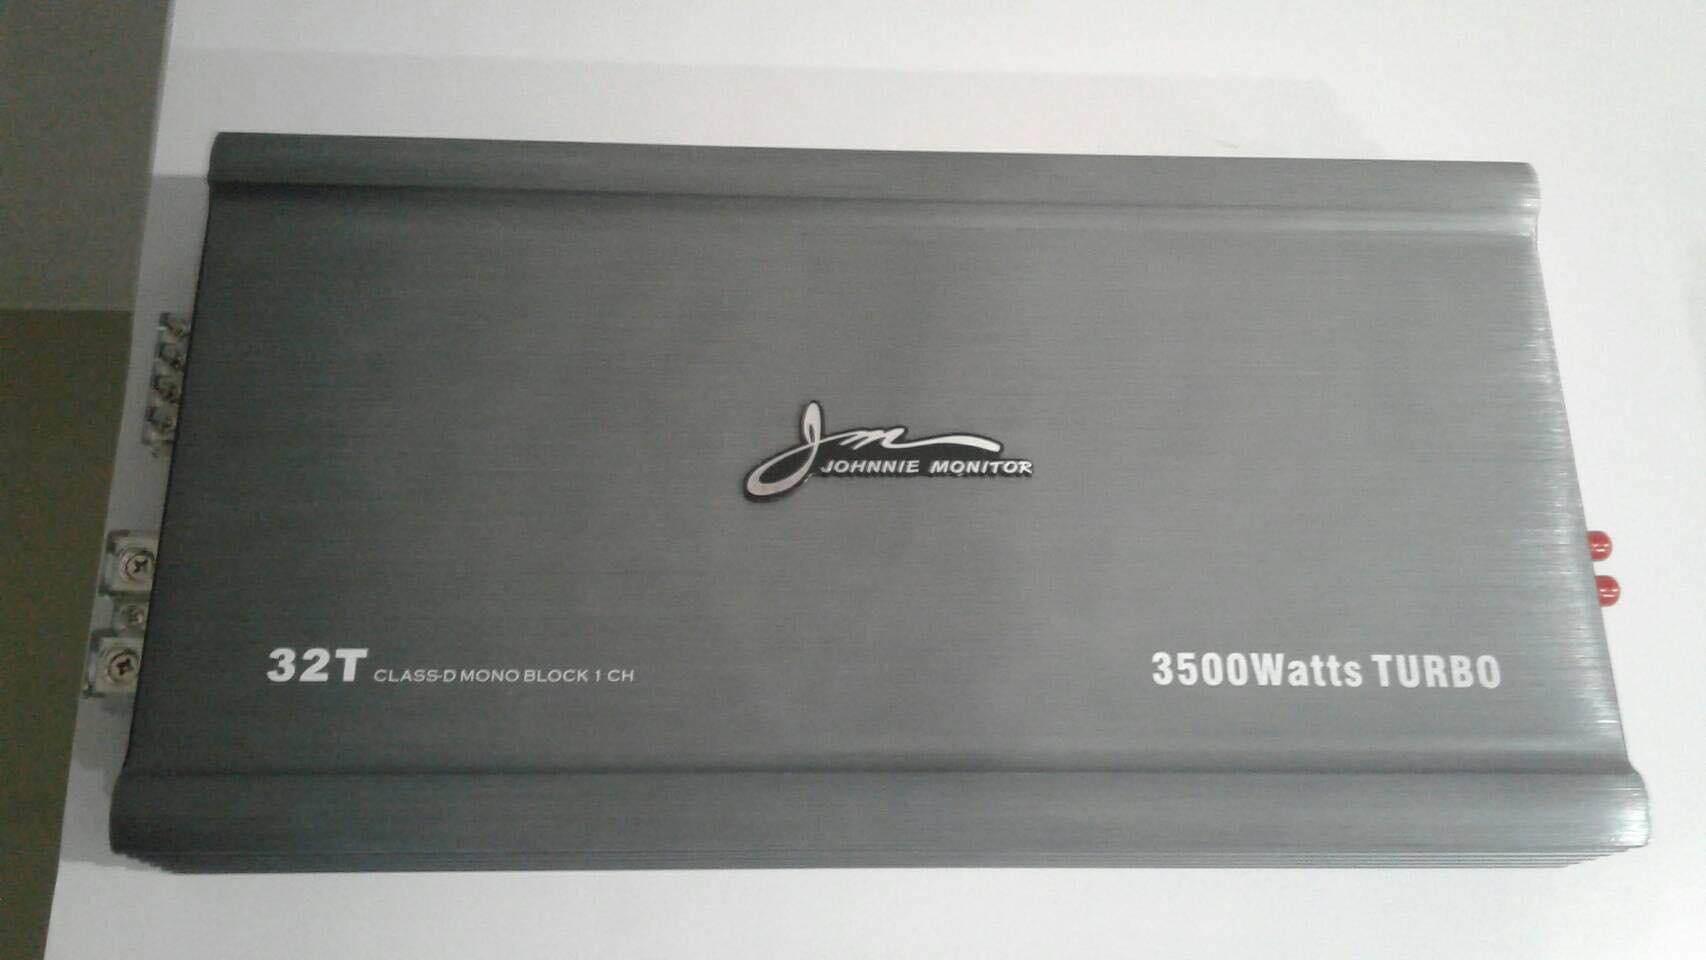 Johnnie Monitor Amp Classd 3500w Turbo รุ่น32t โฉมใหม่ คาปา12ลูก แรงๆ แน่นๆ By Activesound.